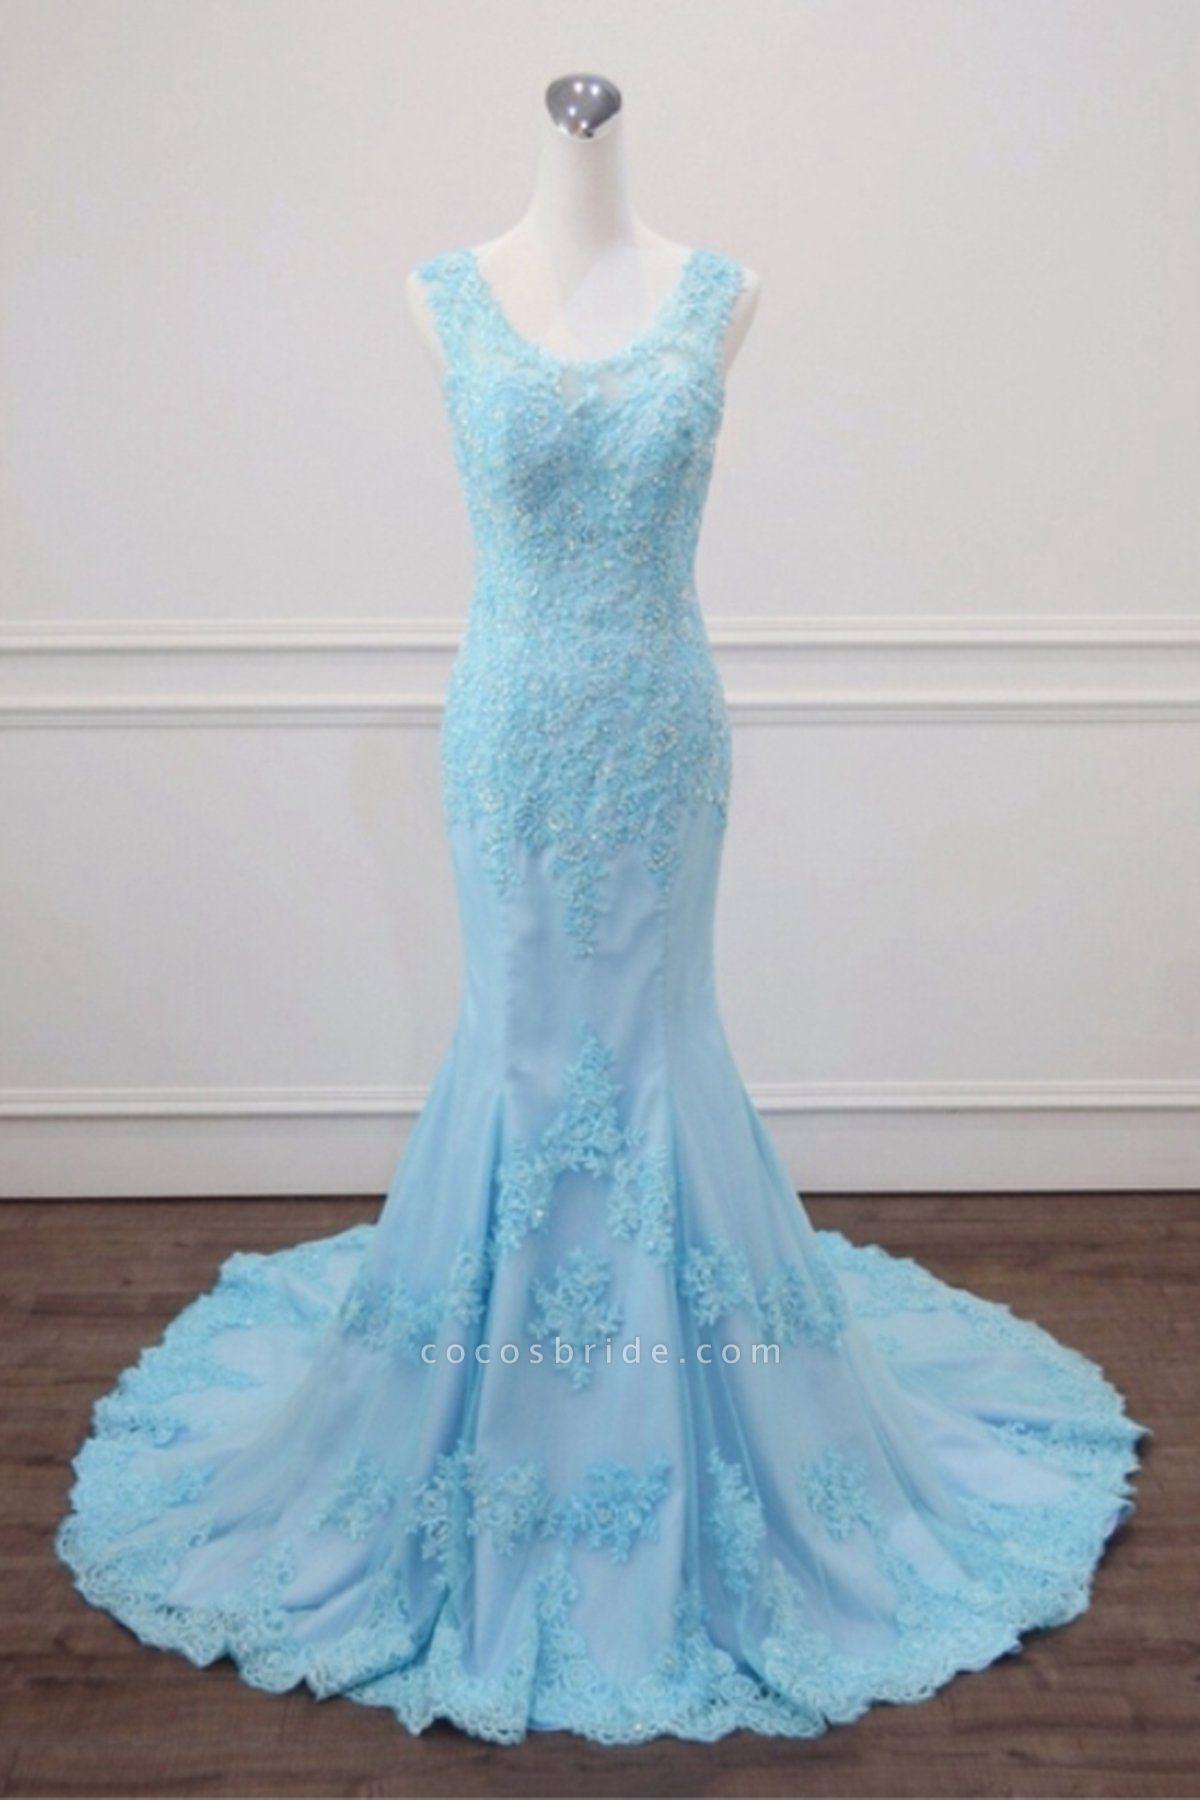 Light Blue Lace Beaded Mermaid Appliques Senior Prom Dress